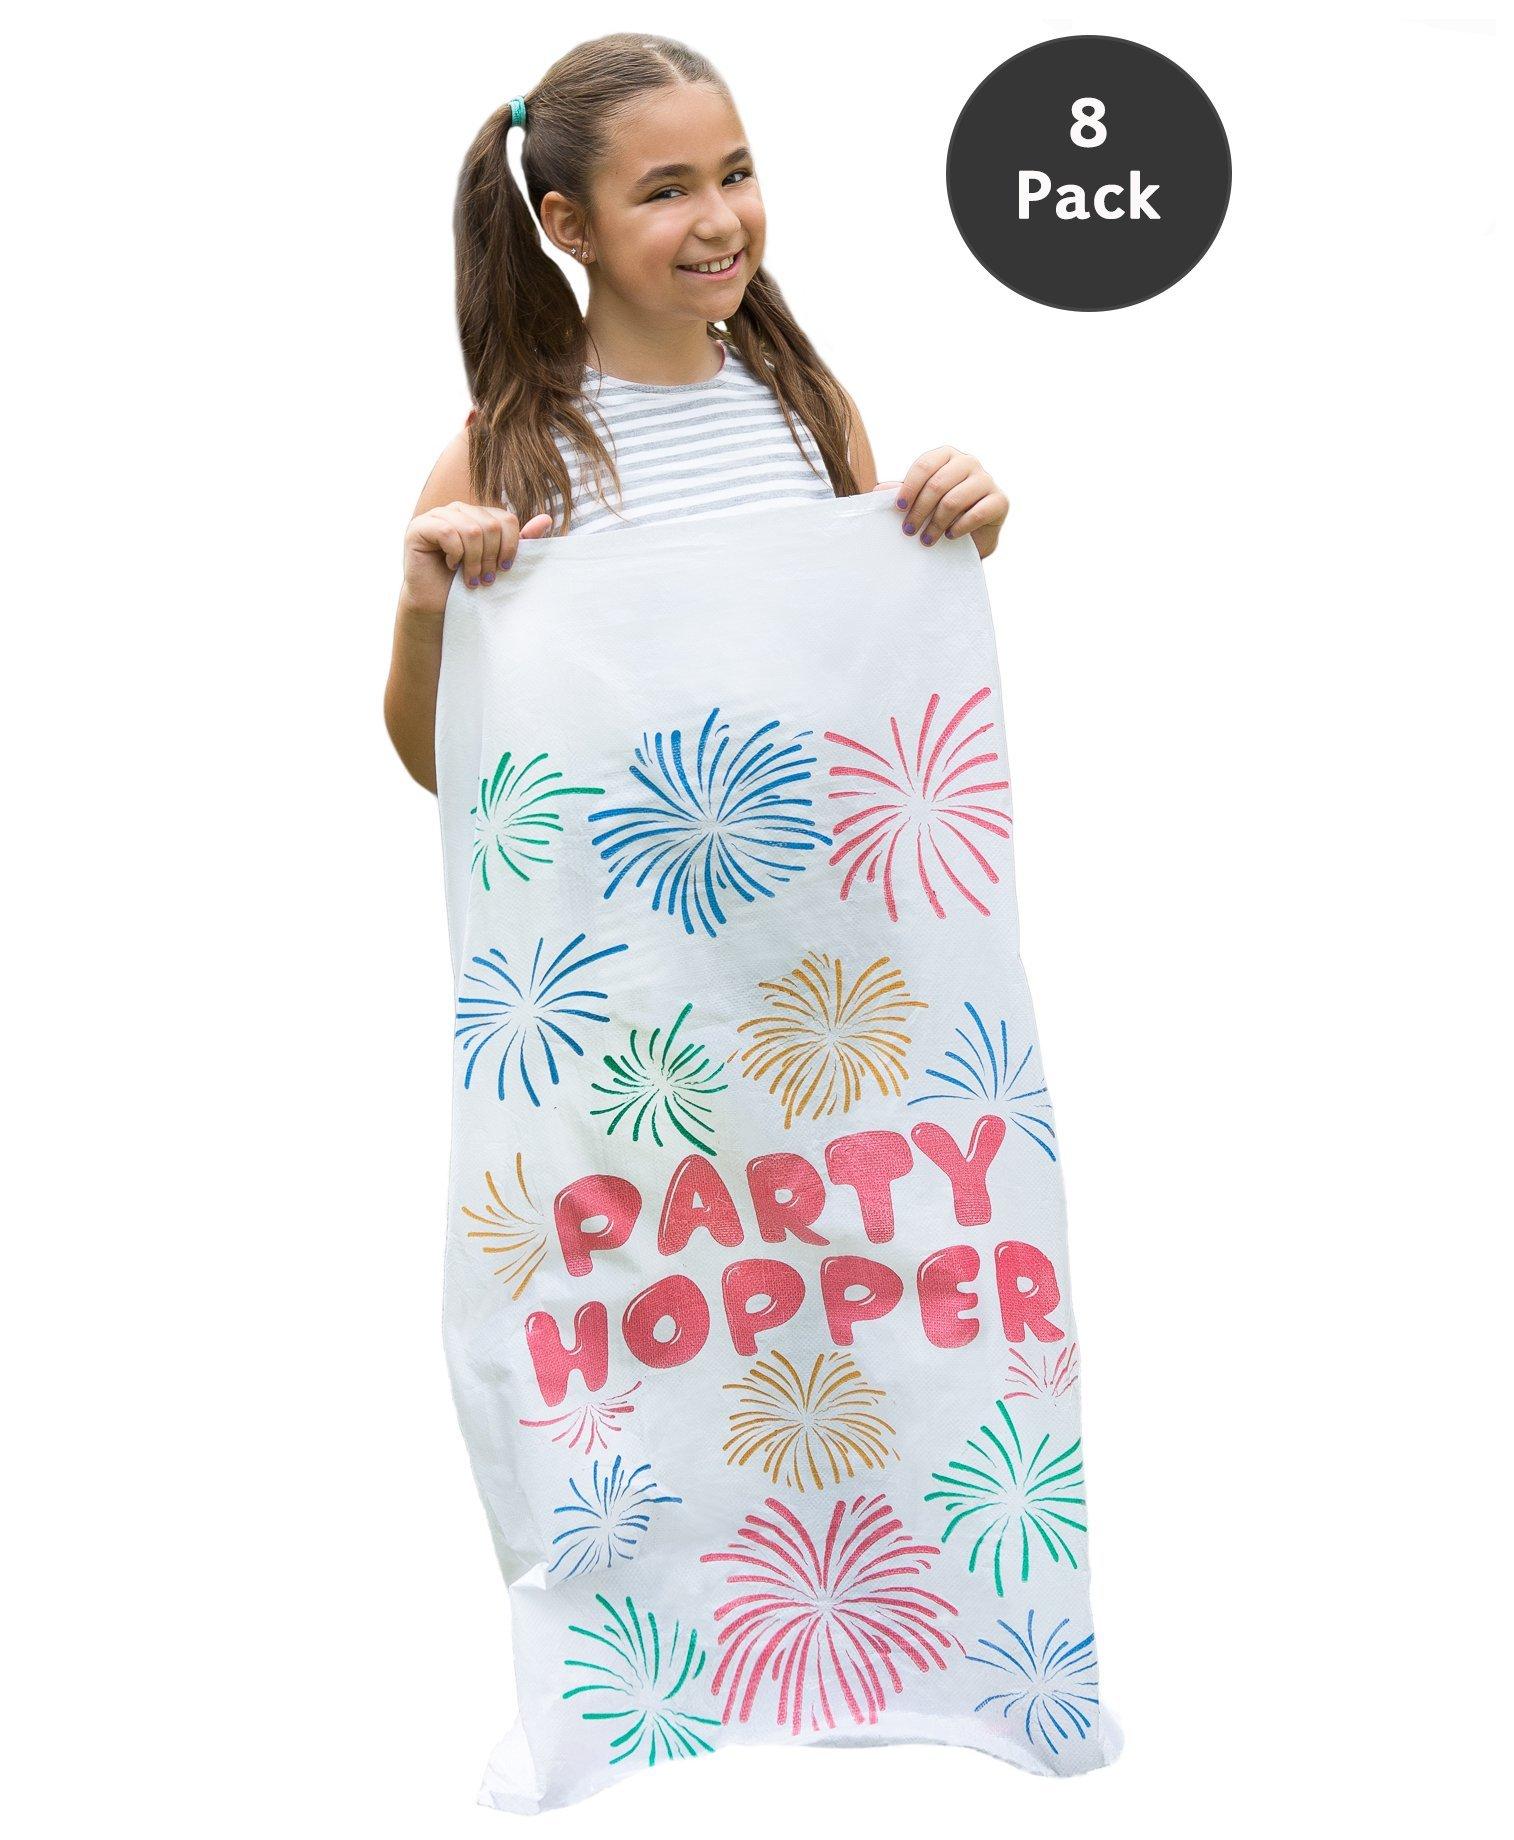 8 PACK - Durable Potato Sack Race Bags, No Weird Burlap Odors, Birthday Party Games